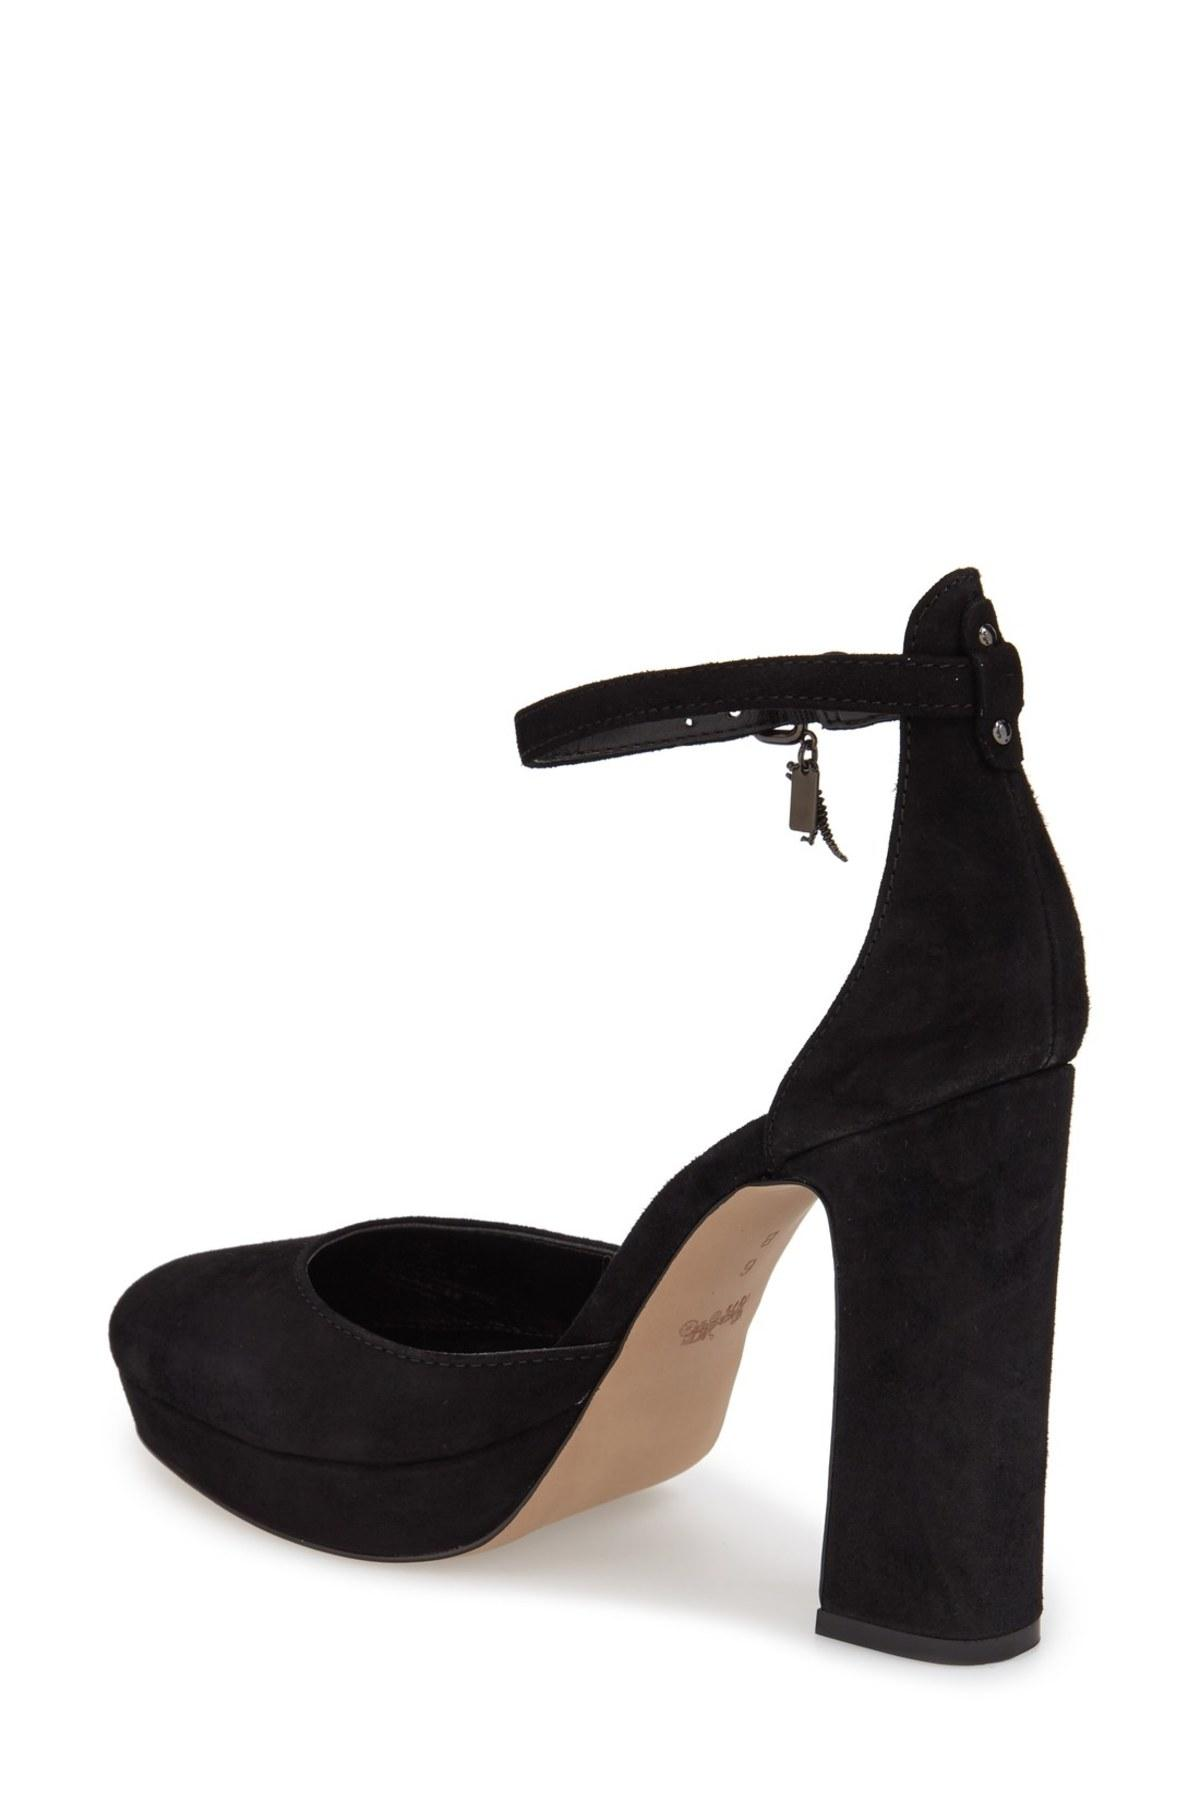 Coach 'chrystie' Ankle Strap Pump (women) in Black | Lyst